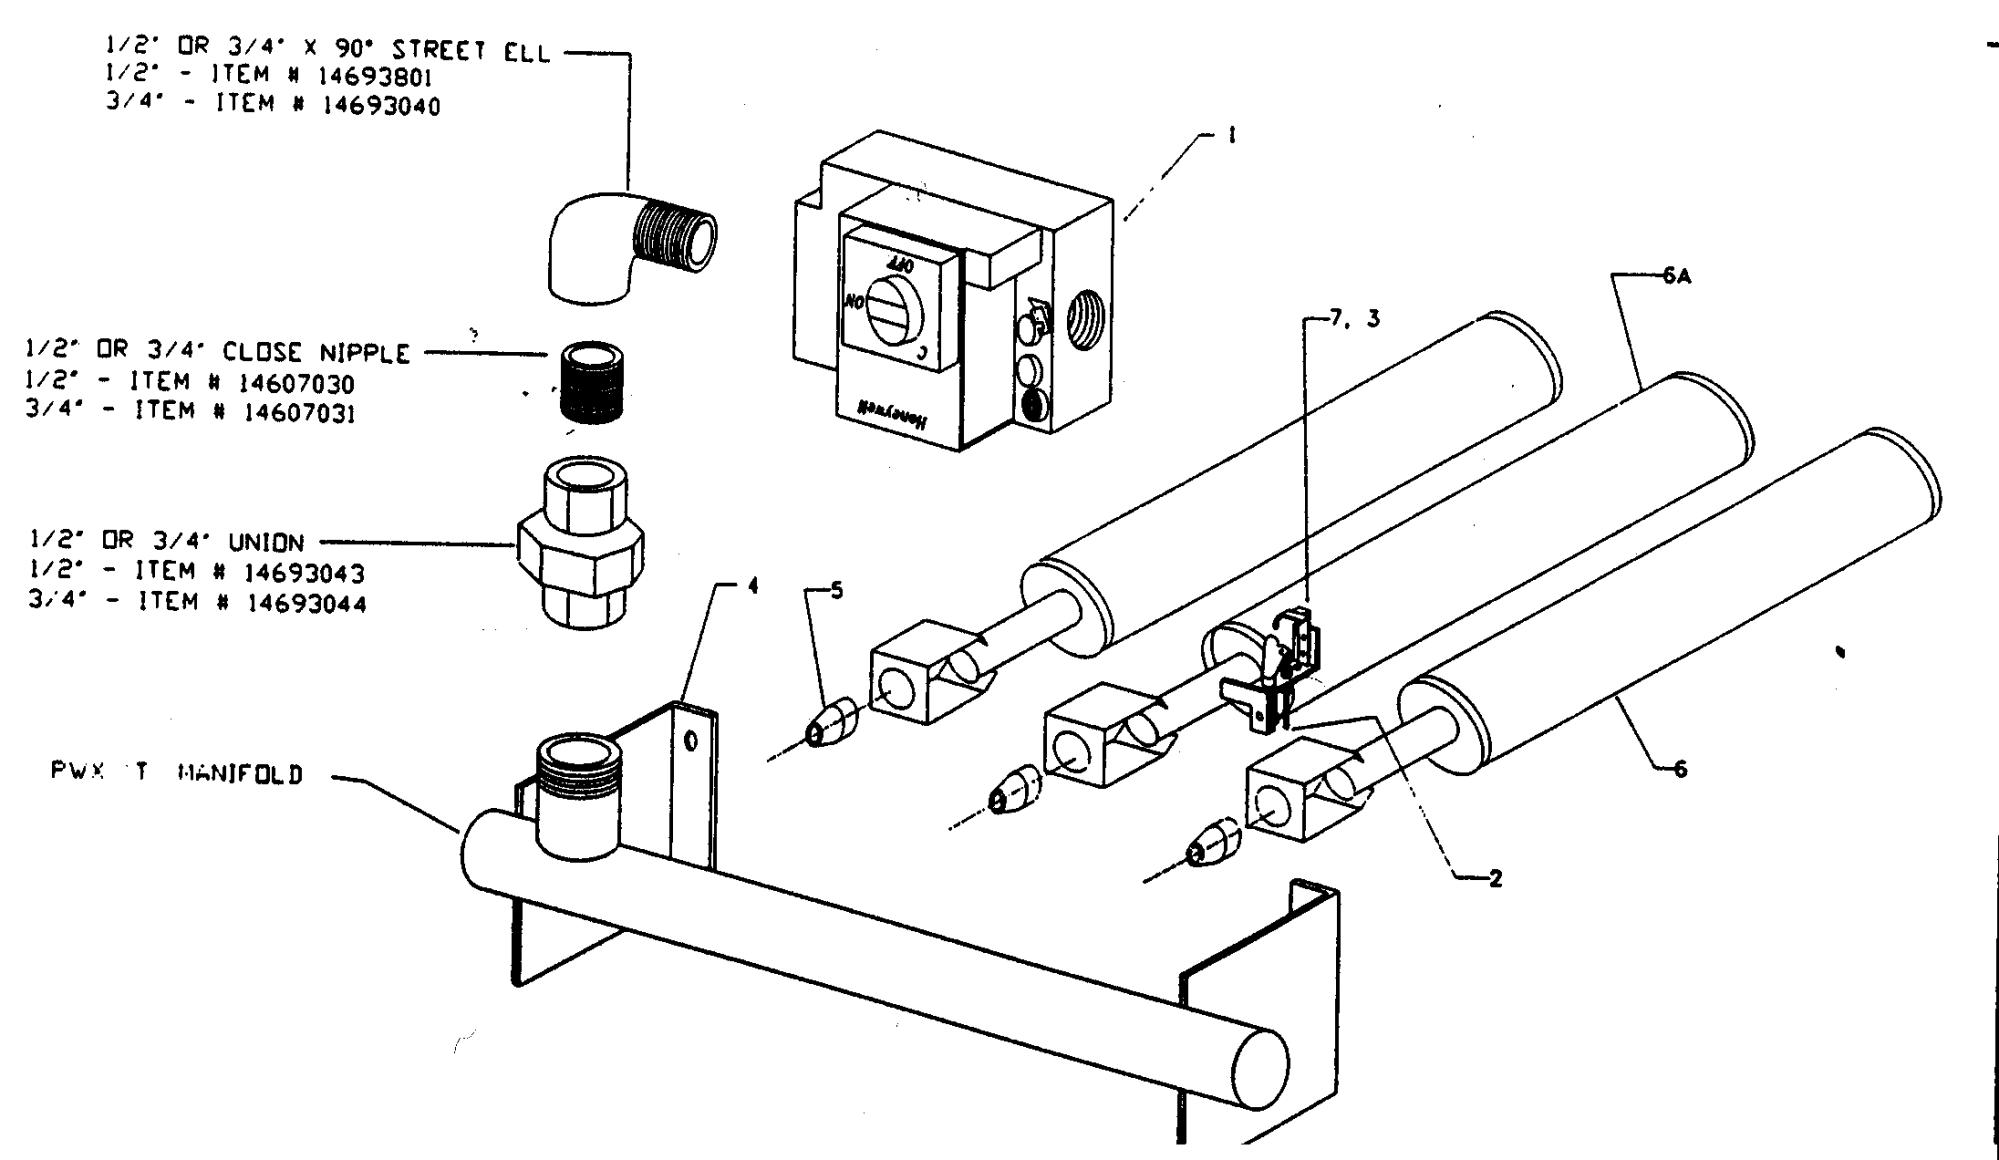 hight resolution of boiler part diagram